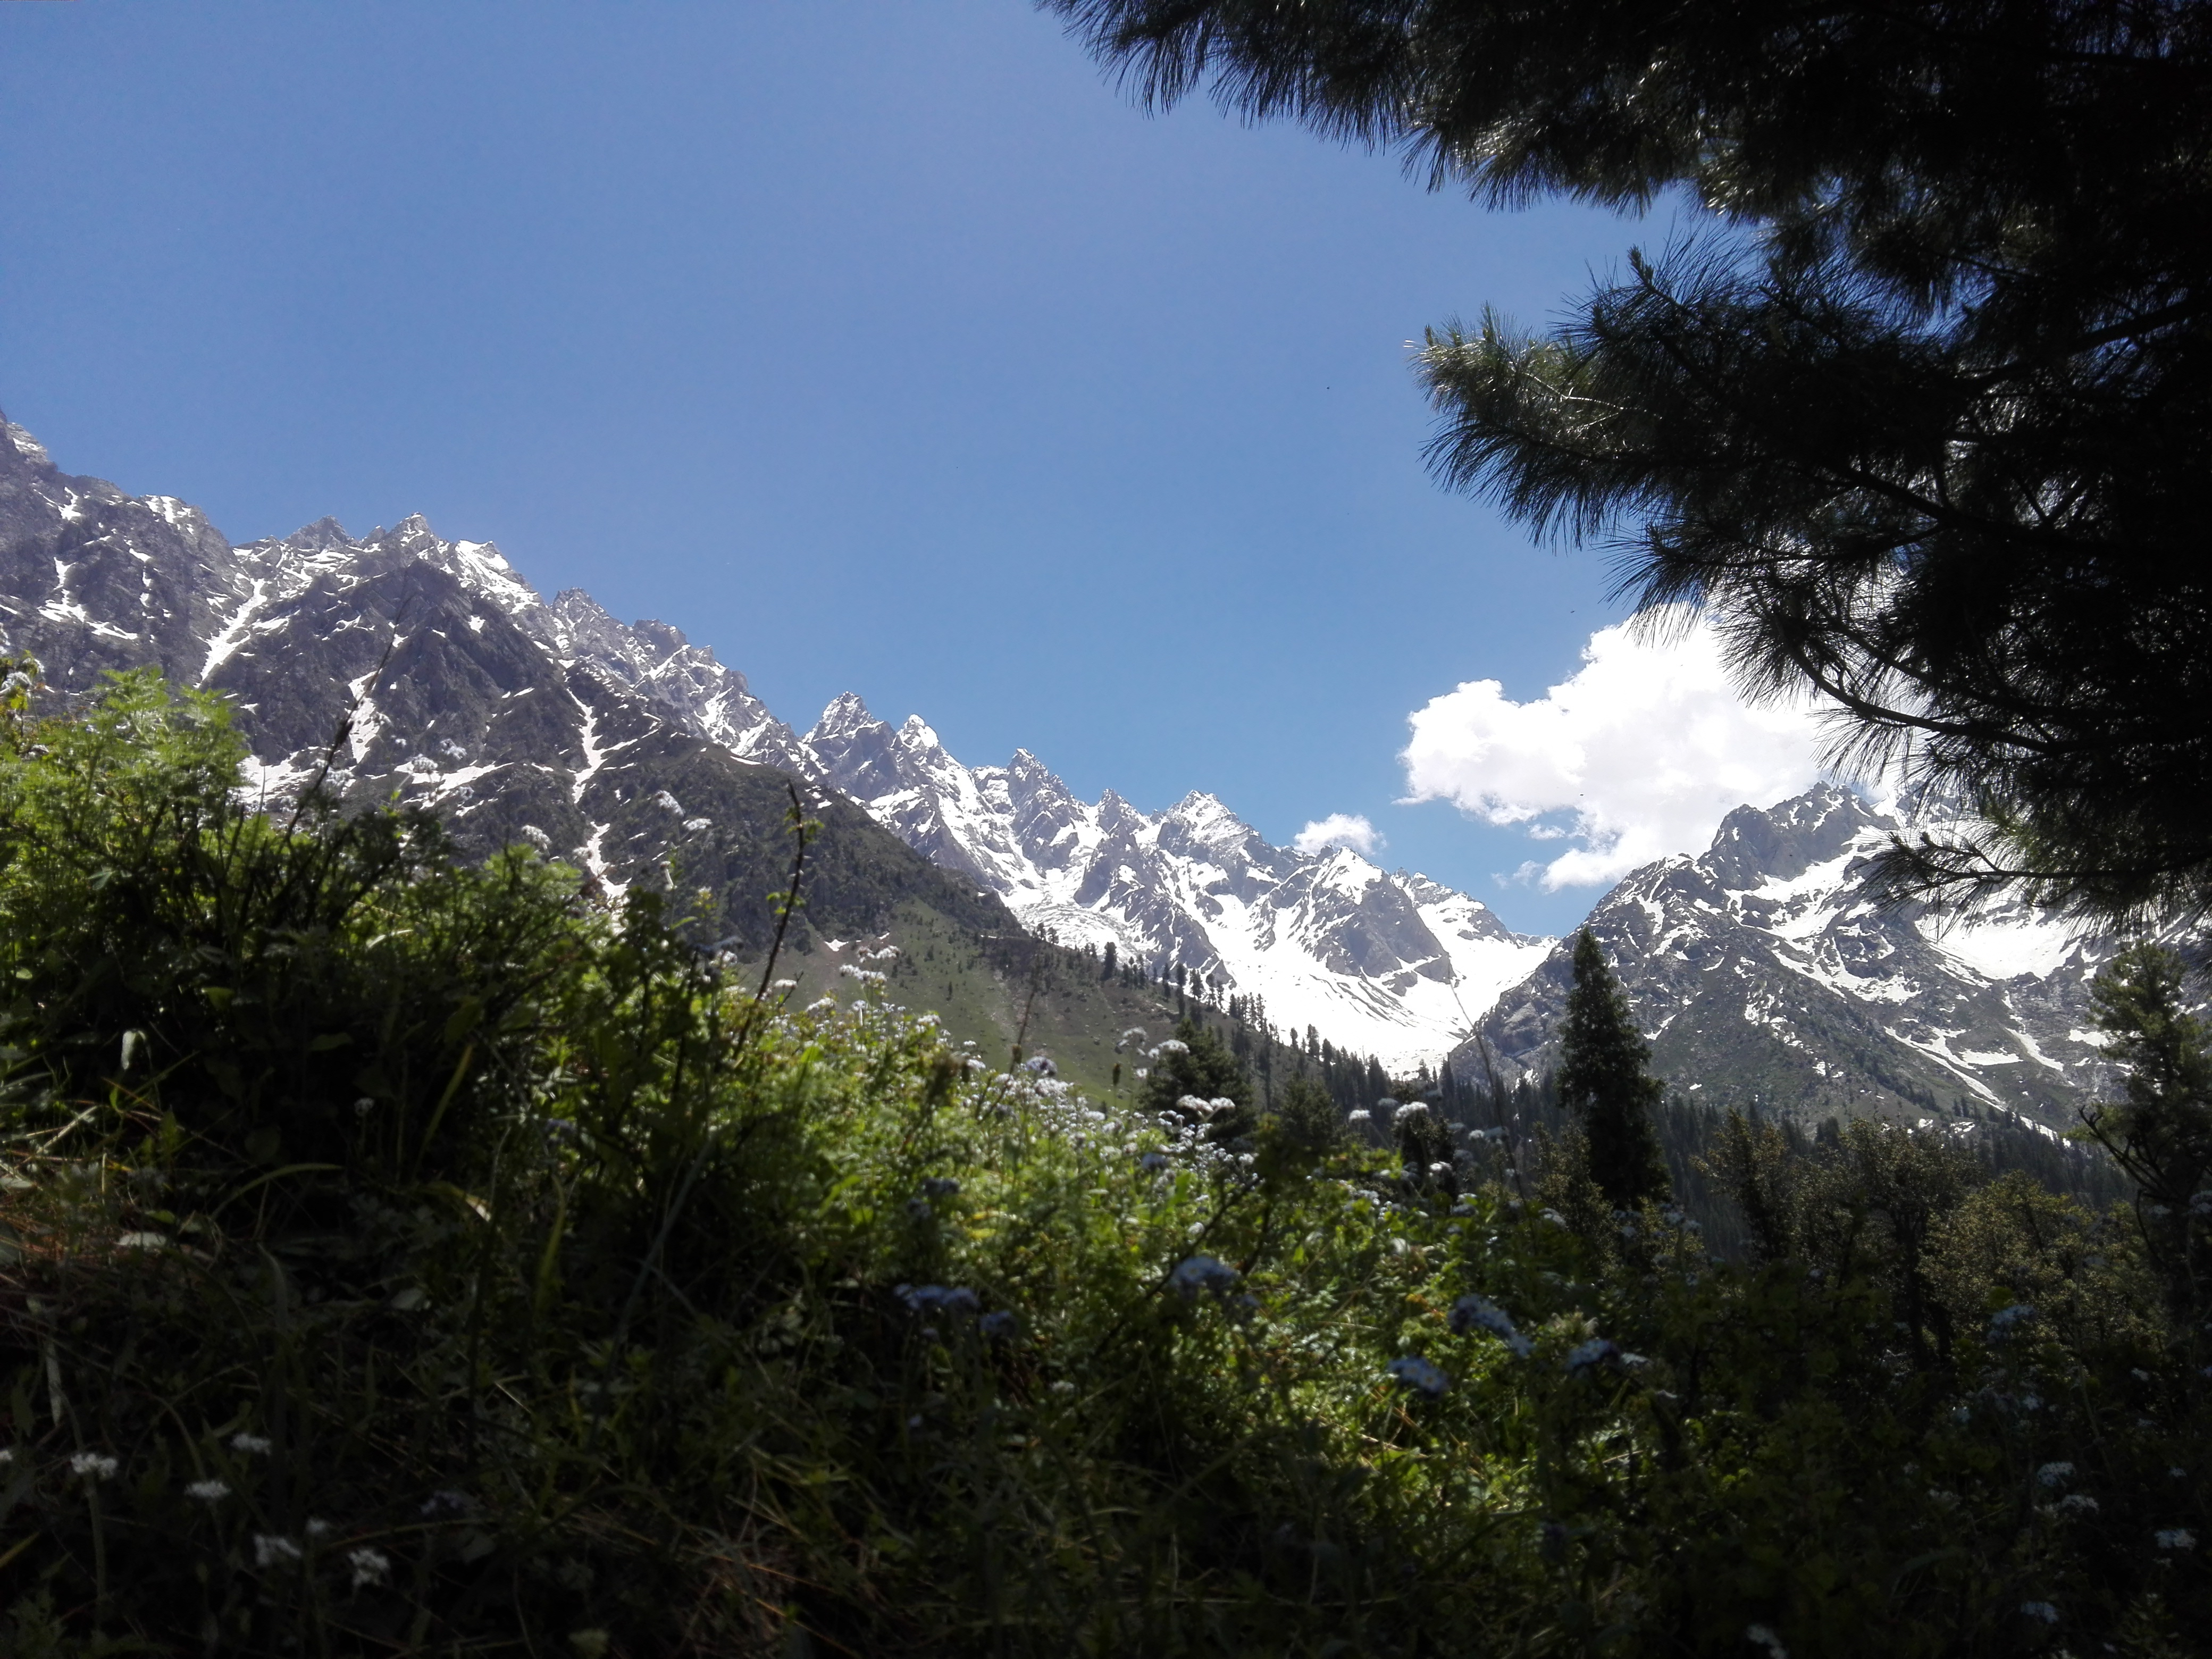 File:Ushu Glaciers of Swat, Kalam, Pakistan.jpg